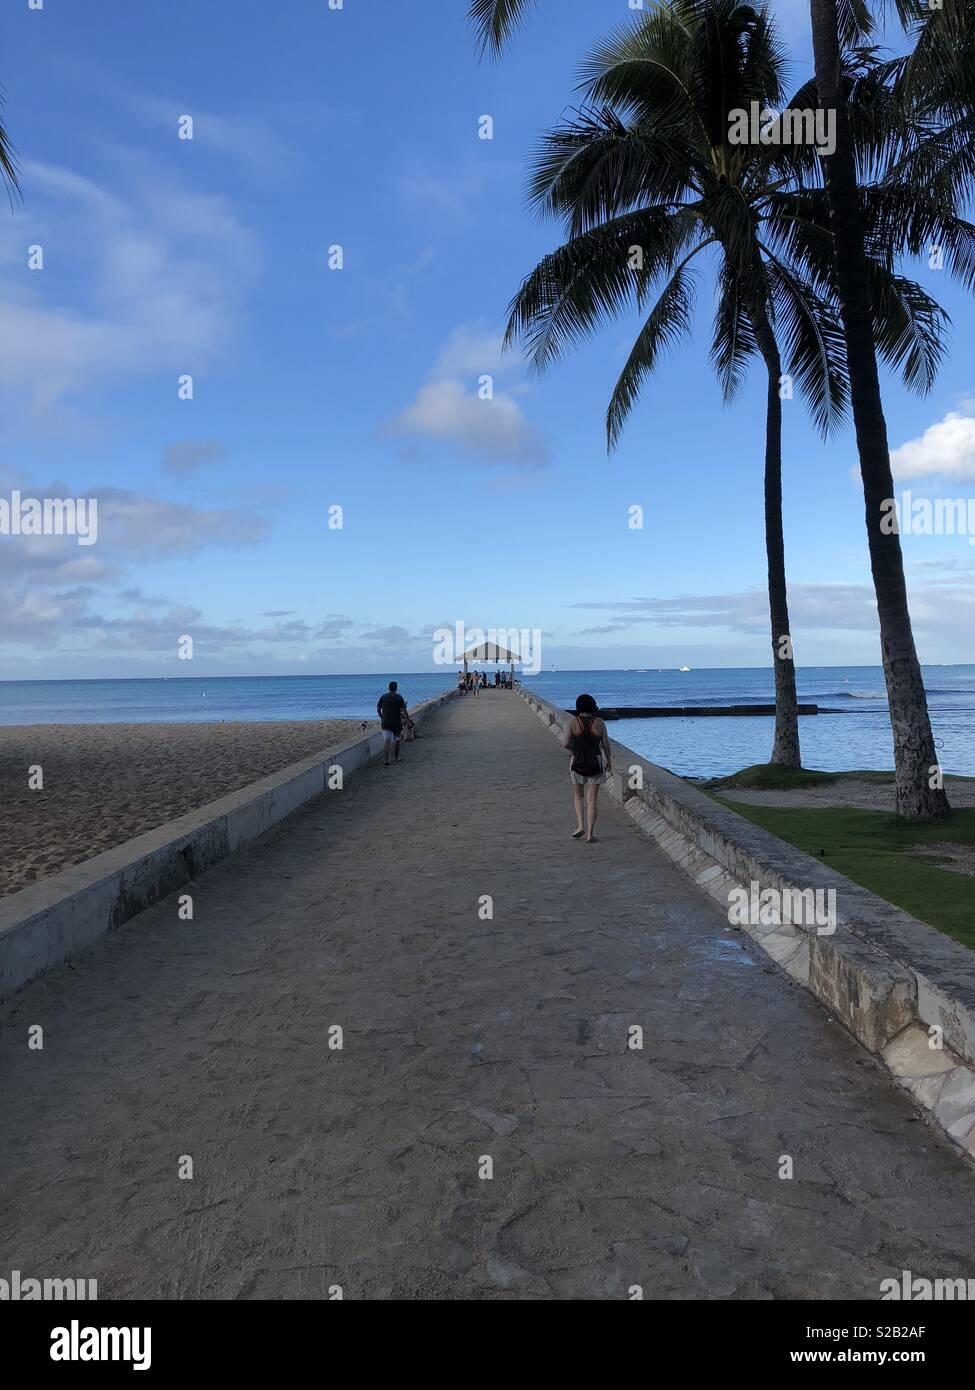 Scenery In Waikiki Beach Hawaii Stock Photo 311259271 Alamy